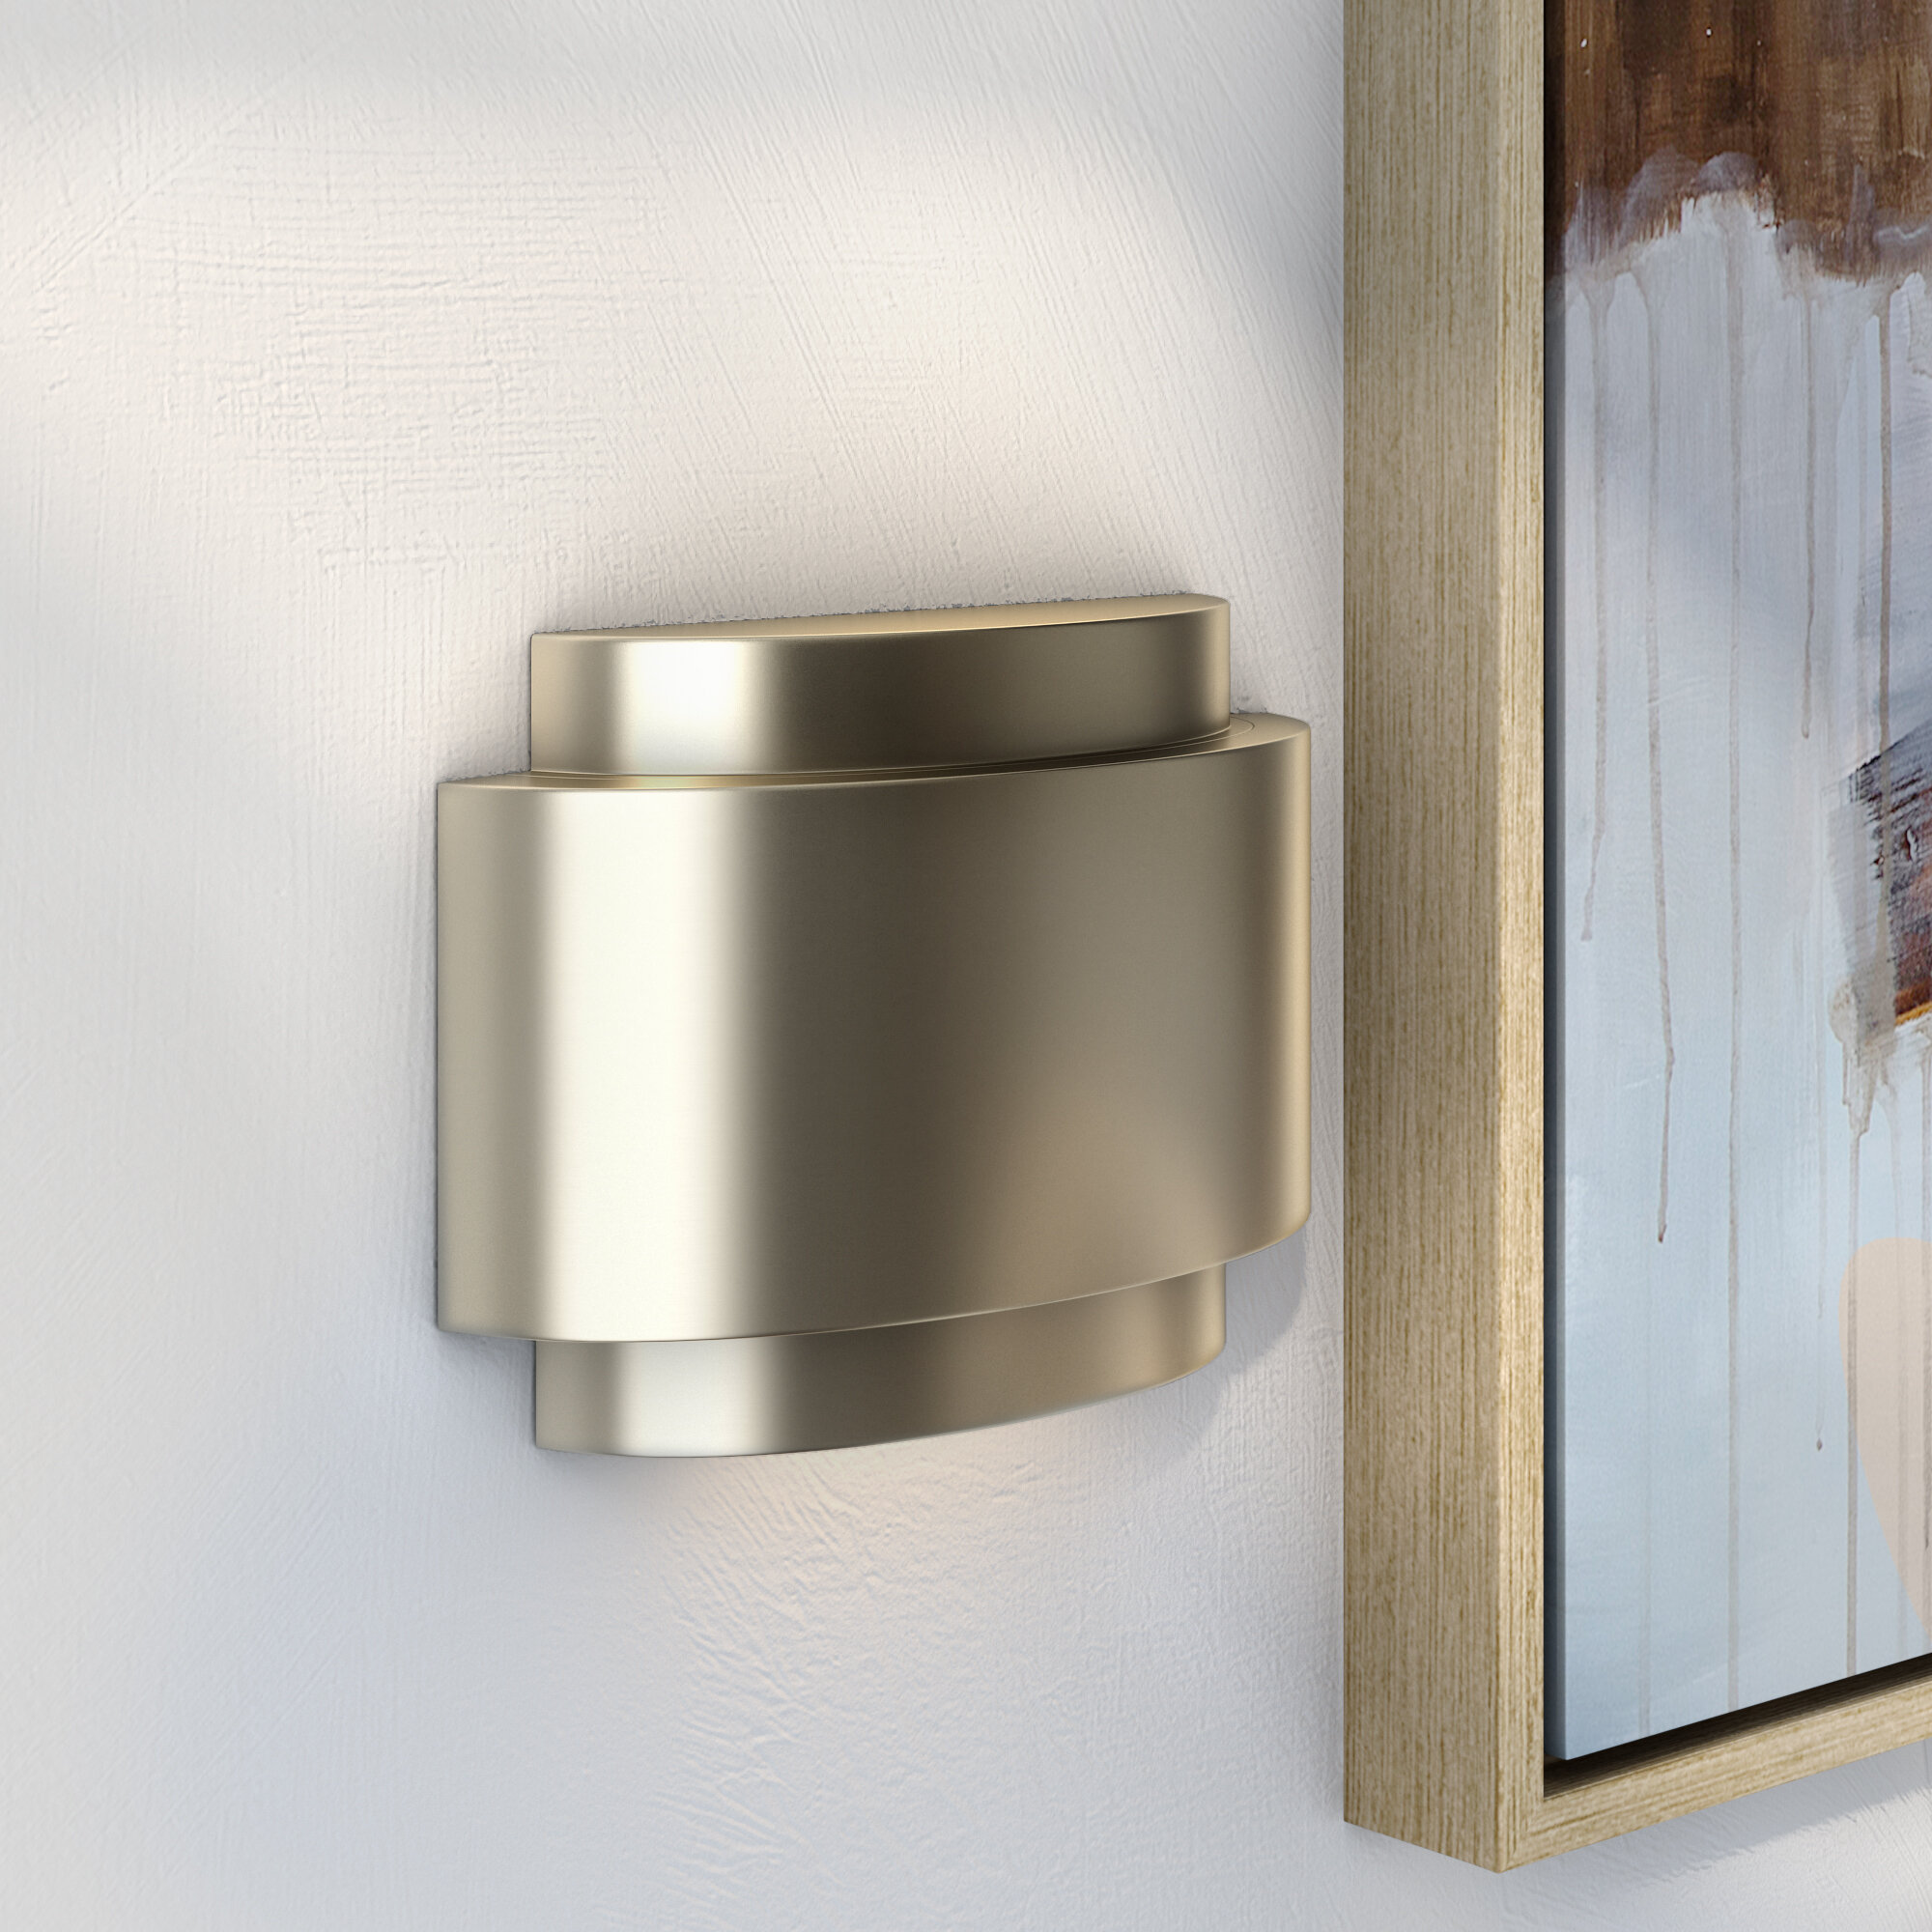 Wade Logan Contemporary Door Chime In Stainless Steel Reviews Wayfair